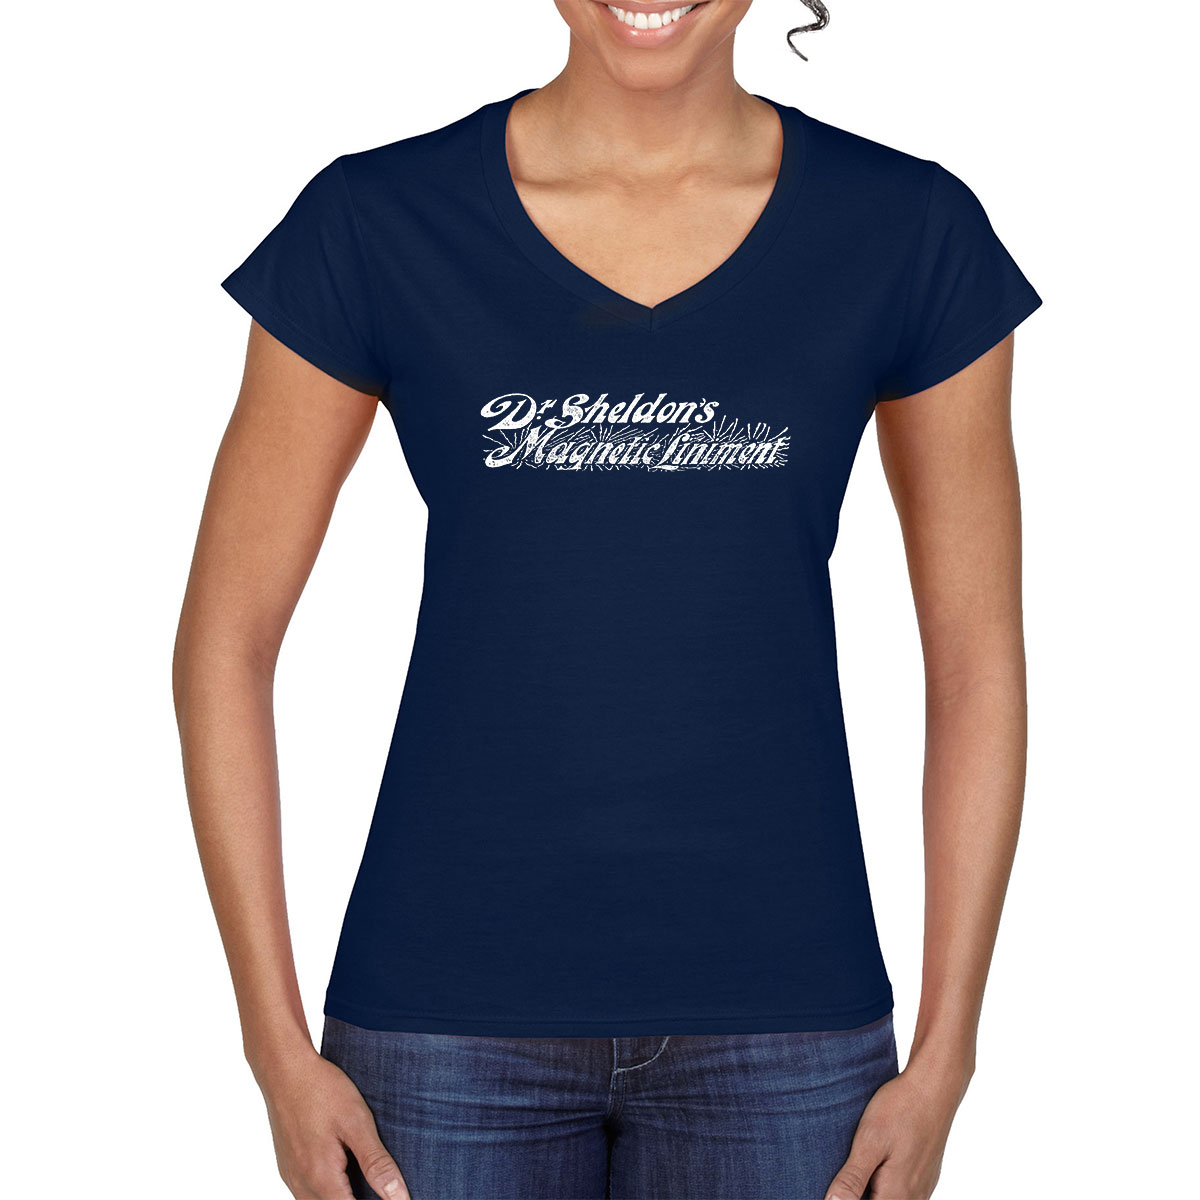 Dr Sheldon's Magnetic Liniment - Vintage Ad - T-Shirt